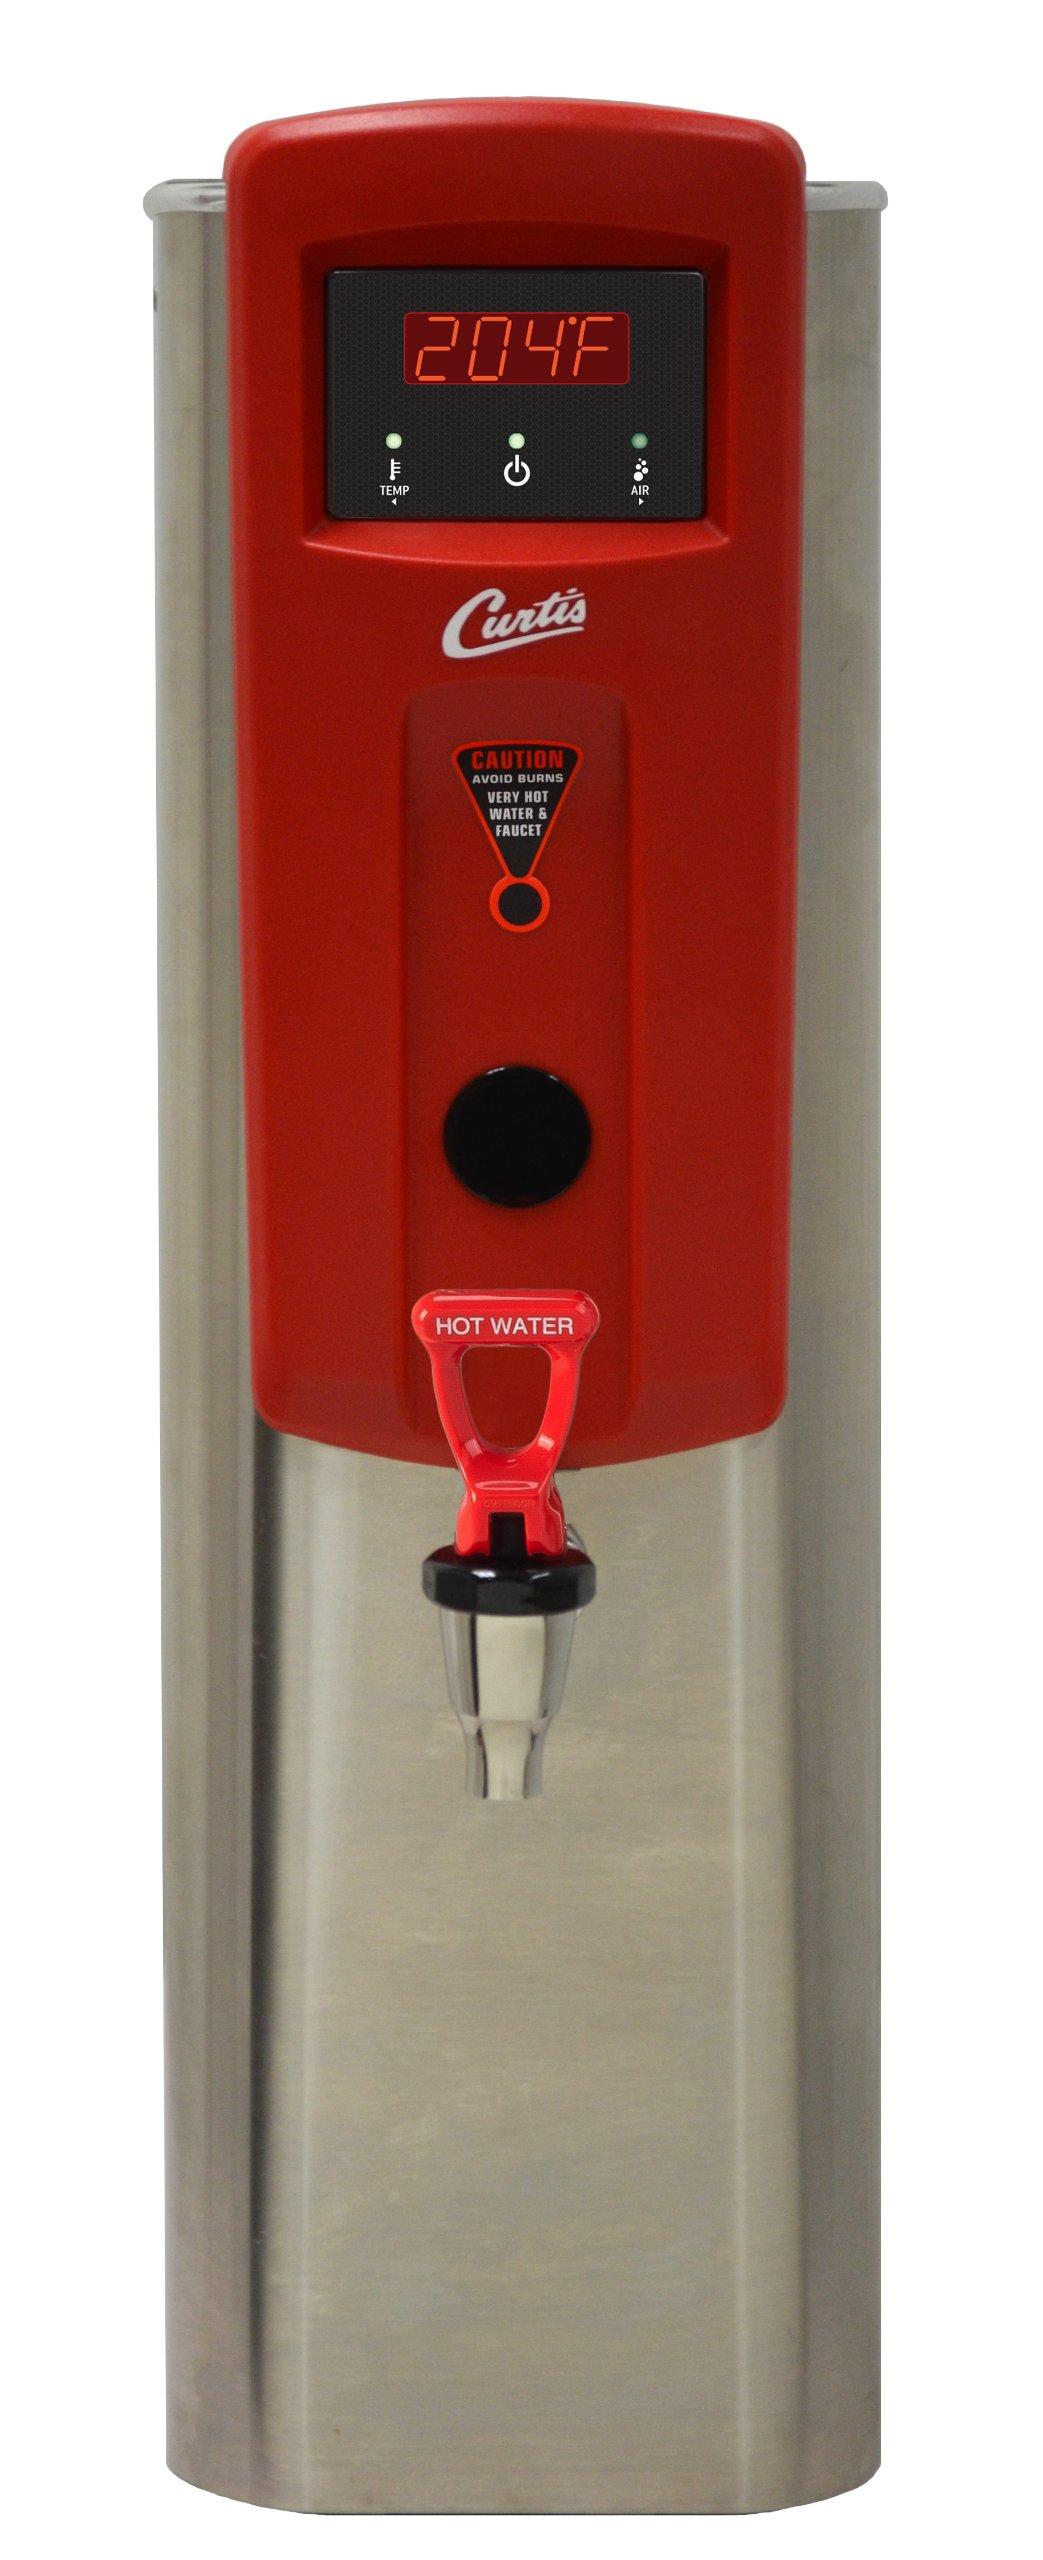 "Wilbur Curtis Hot Water Dispenser 5.0 Gallon  Narrow, 13.88"" Faucet Height - Commercial Hot Water Dispenser with Digital Control Module - WB5NL (Each) by Wilbur Curtis"